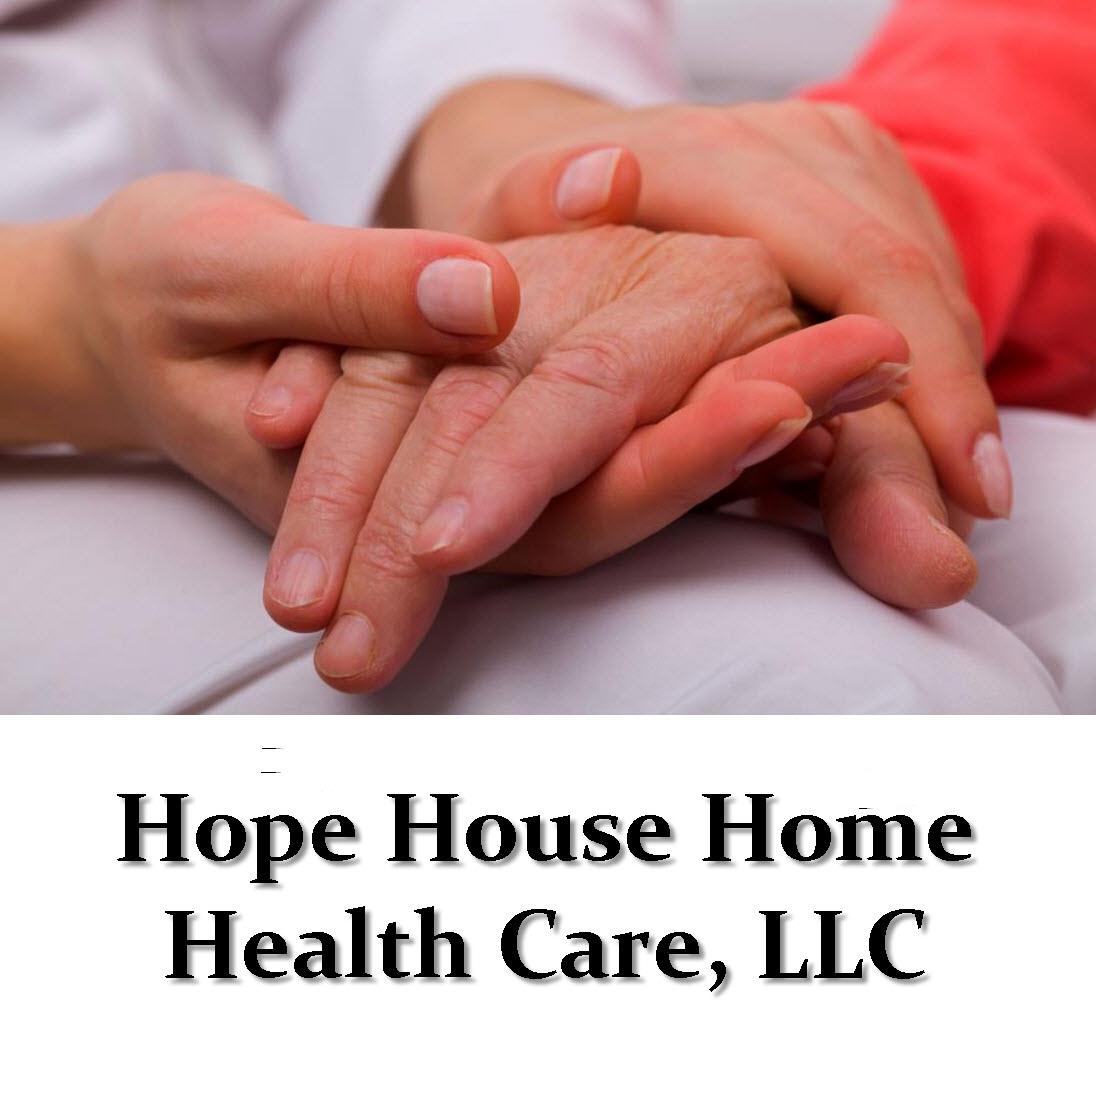 Hope House Home Health Care, LLC